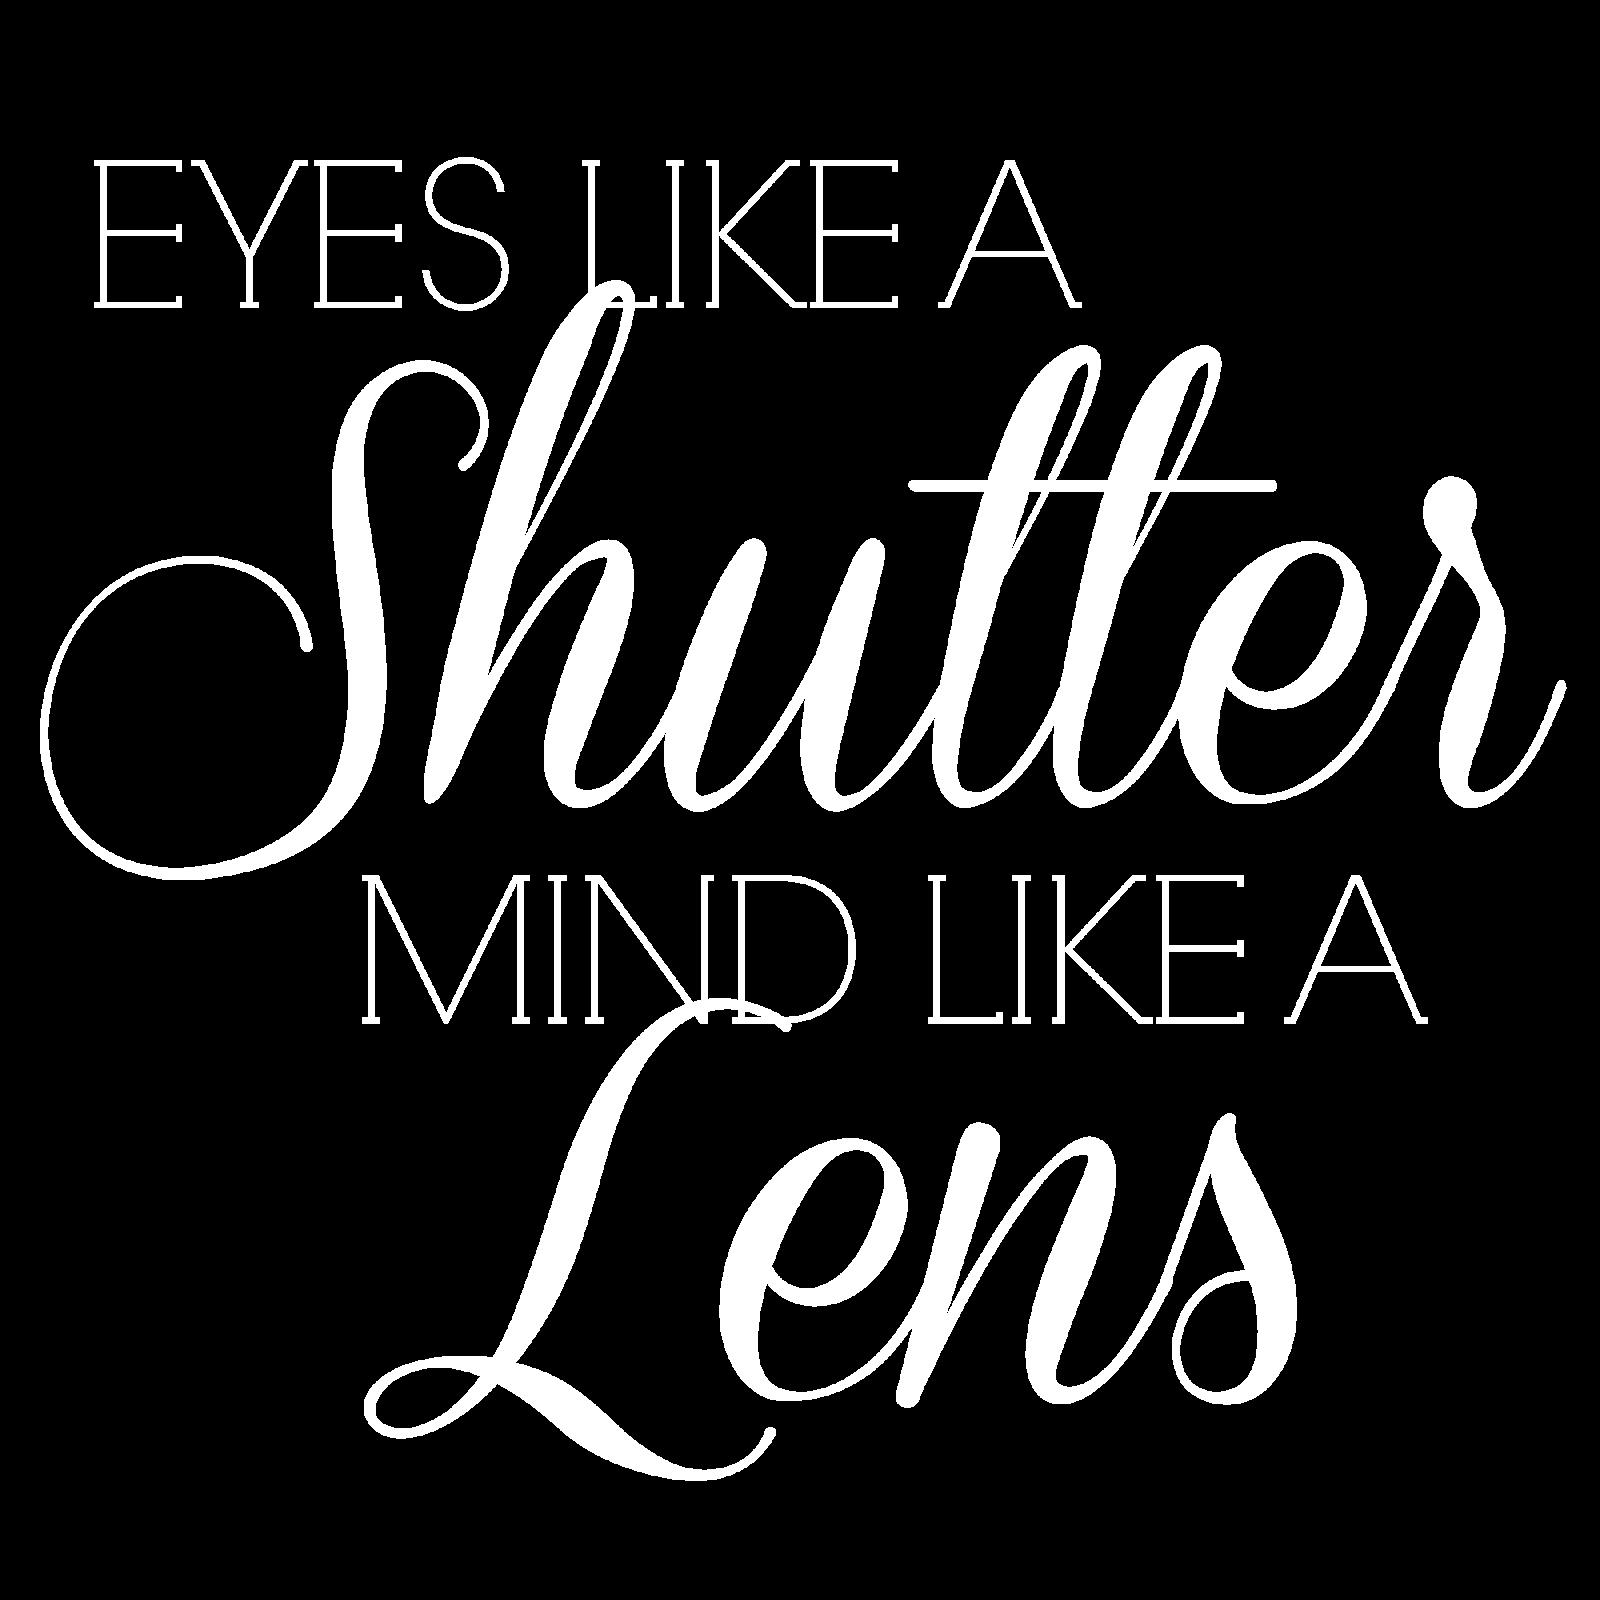 Eyes like a shutter...